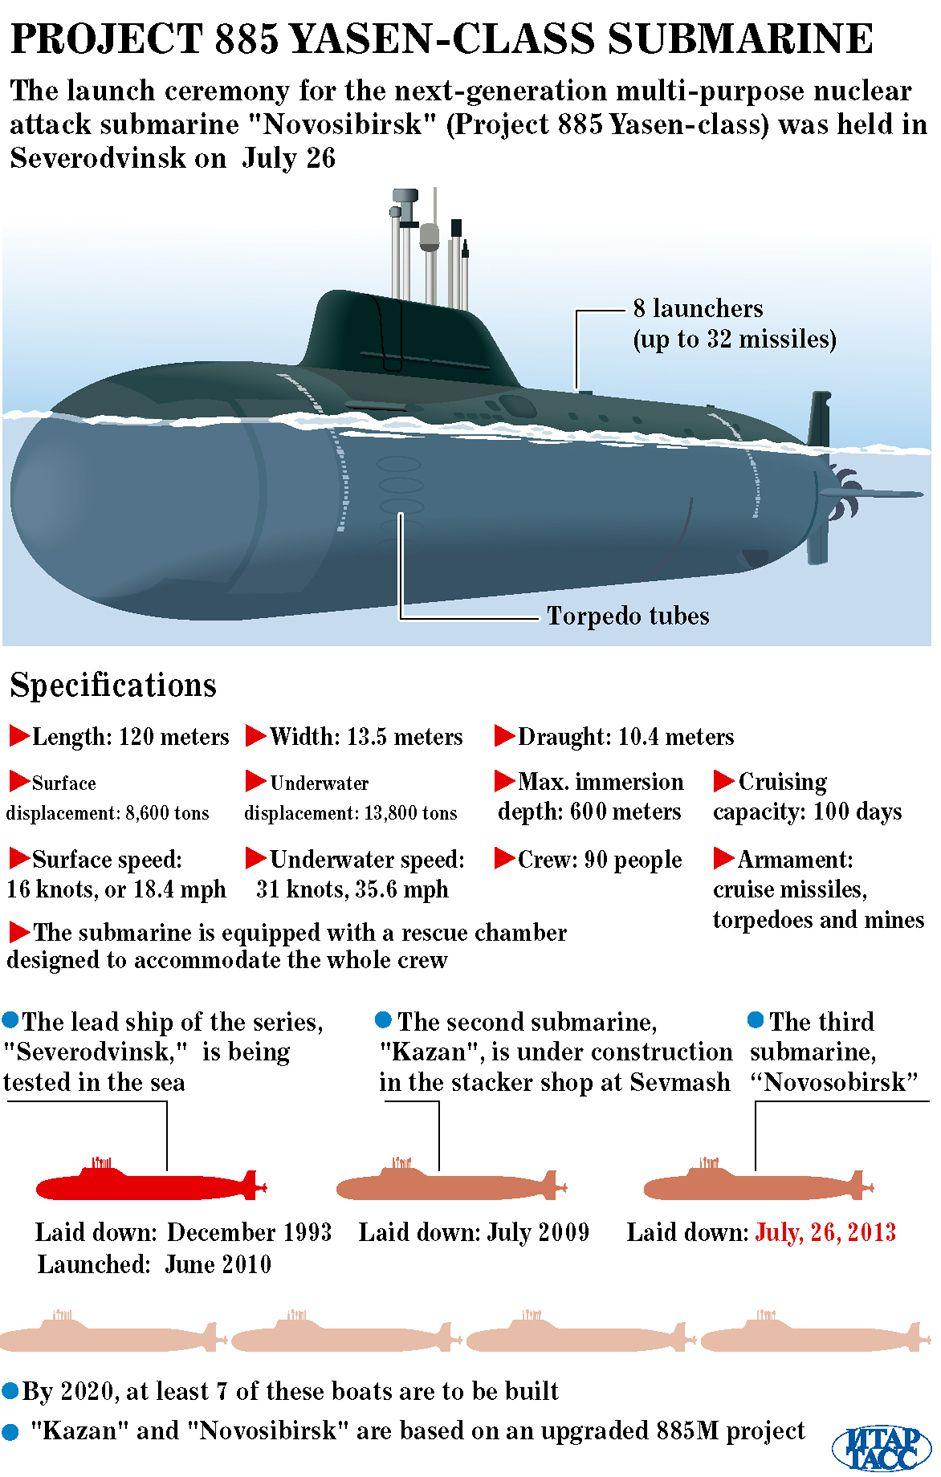 Project Yasen M Multirole Nuclear Submarine Data Illustrations